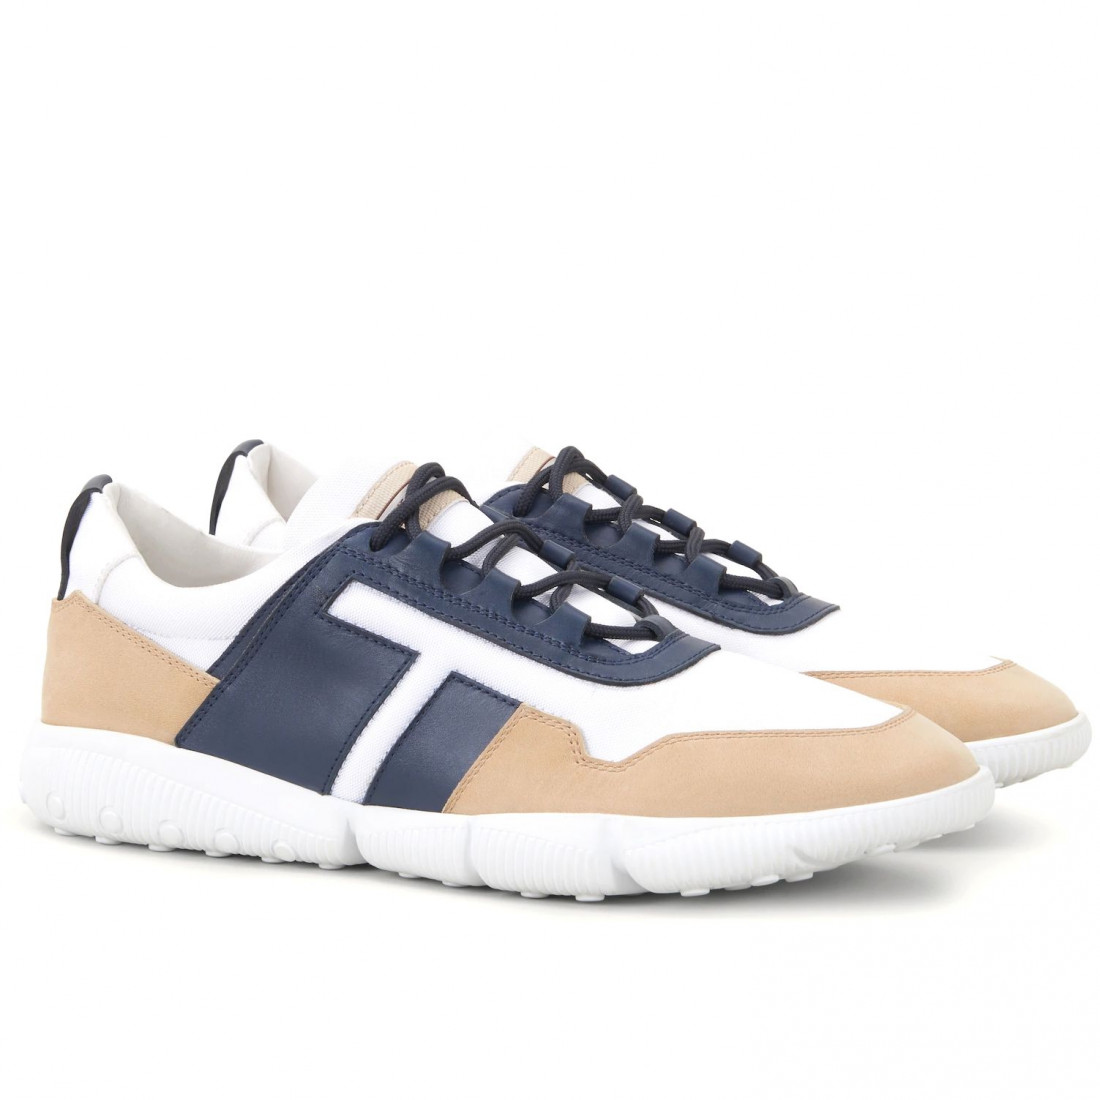 sneakers man tods xxm25c0cp51772vx86 6643